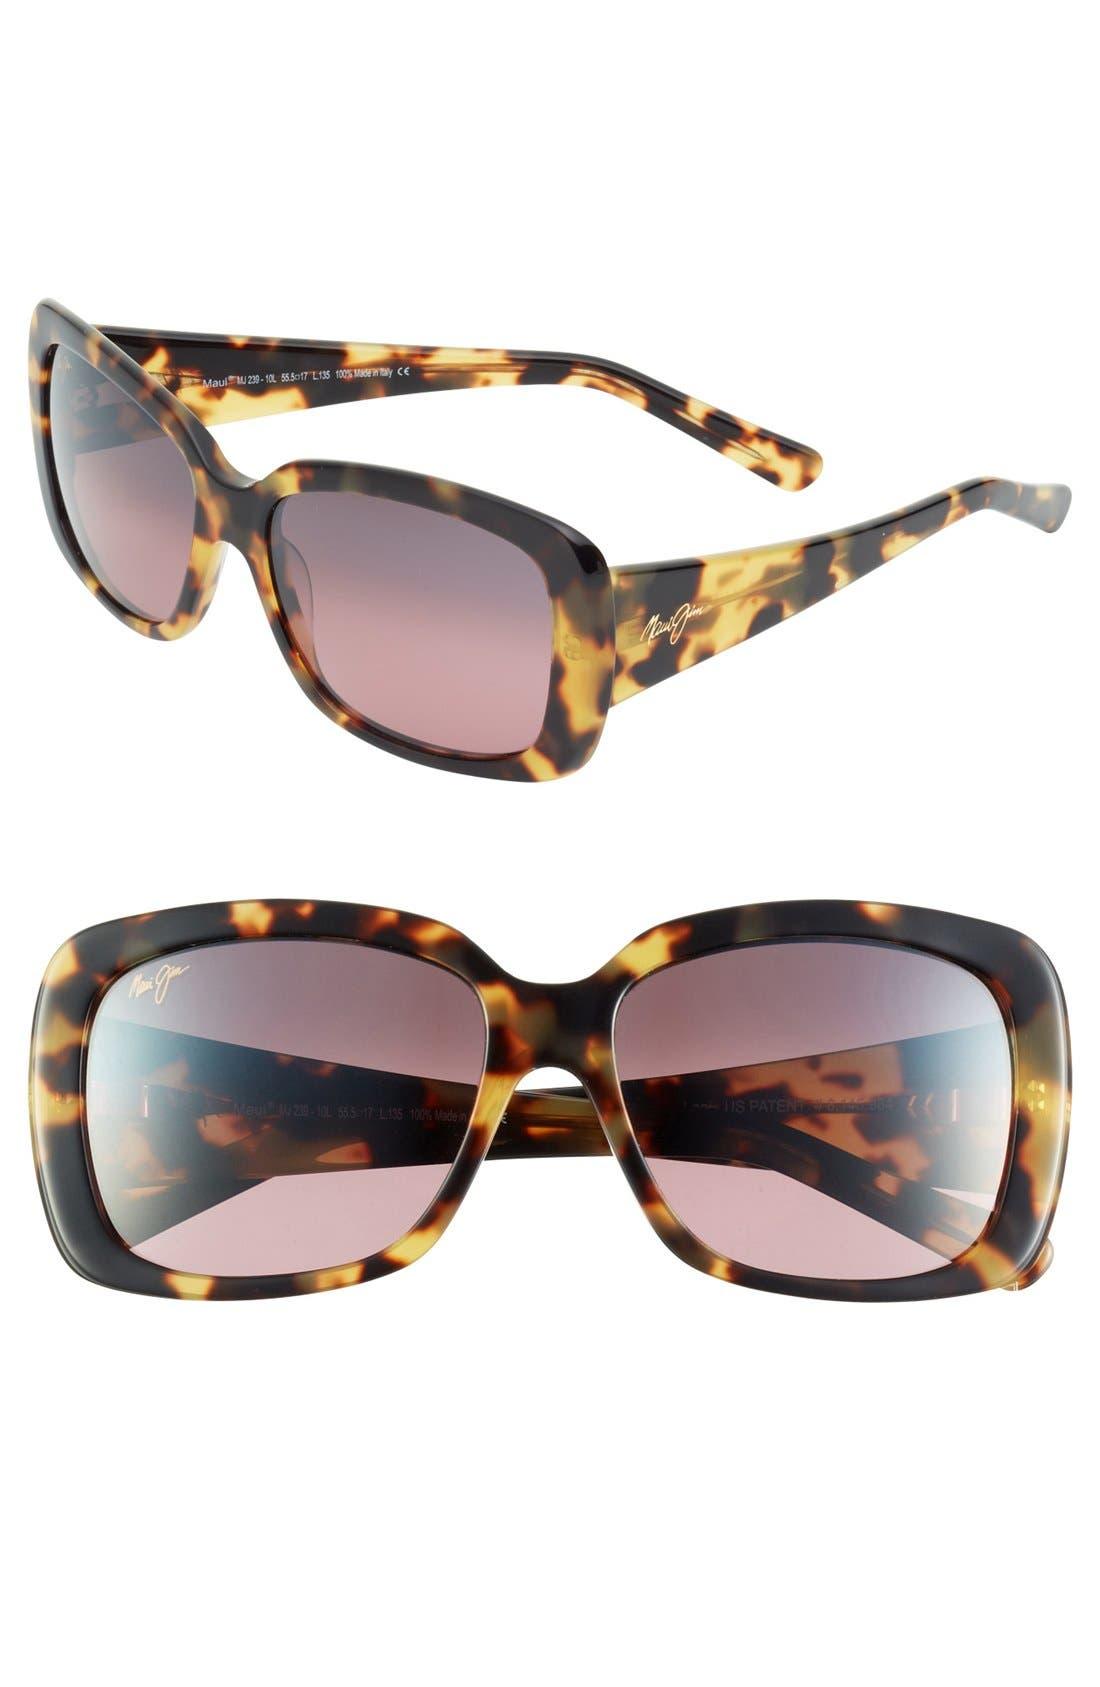 Main Image - Maui Jim 'Lilikoi' 56mm Sunglasses